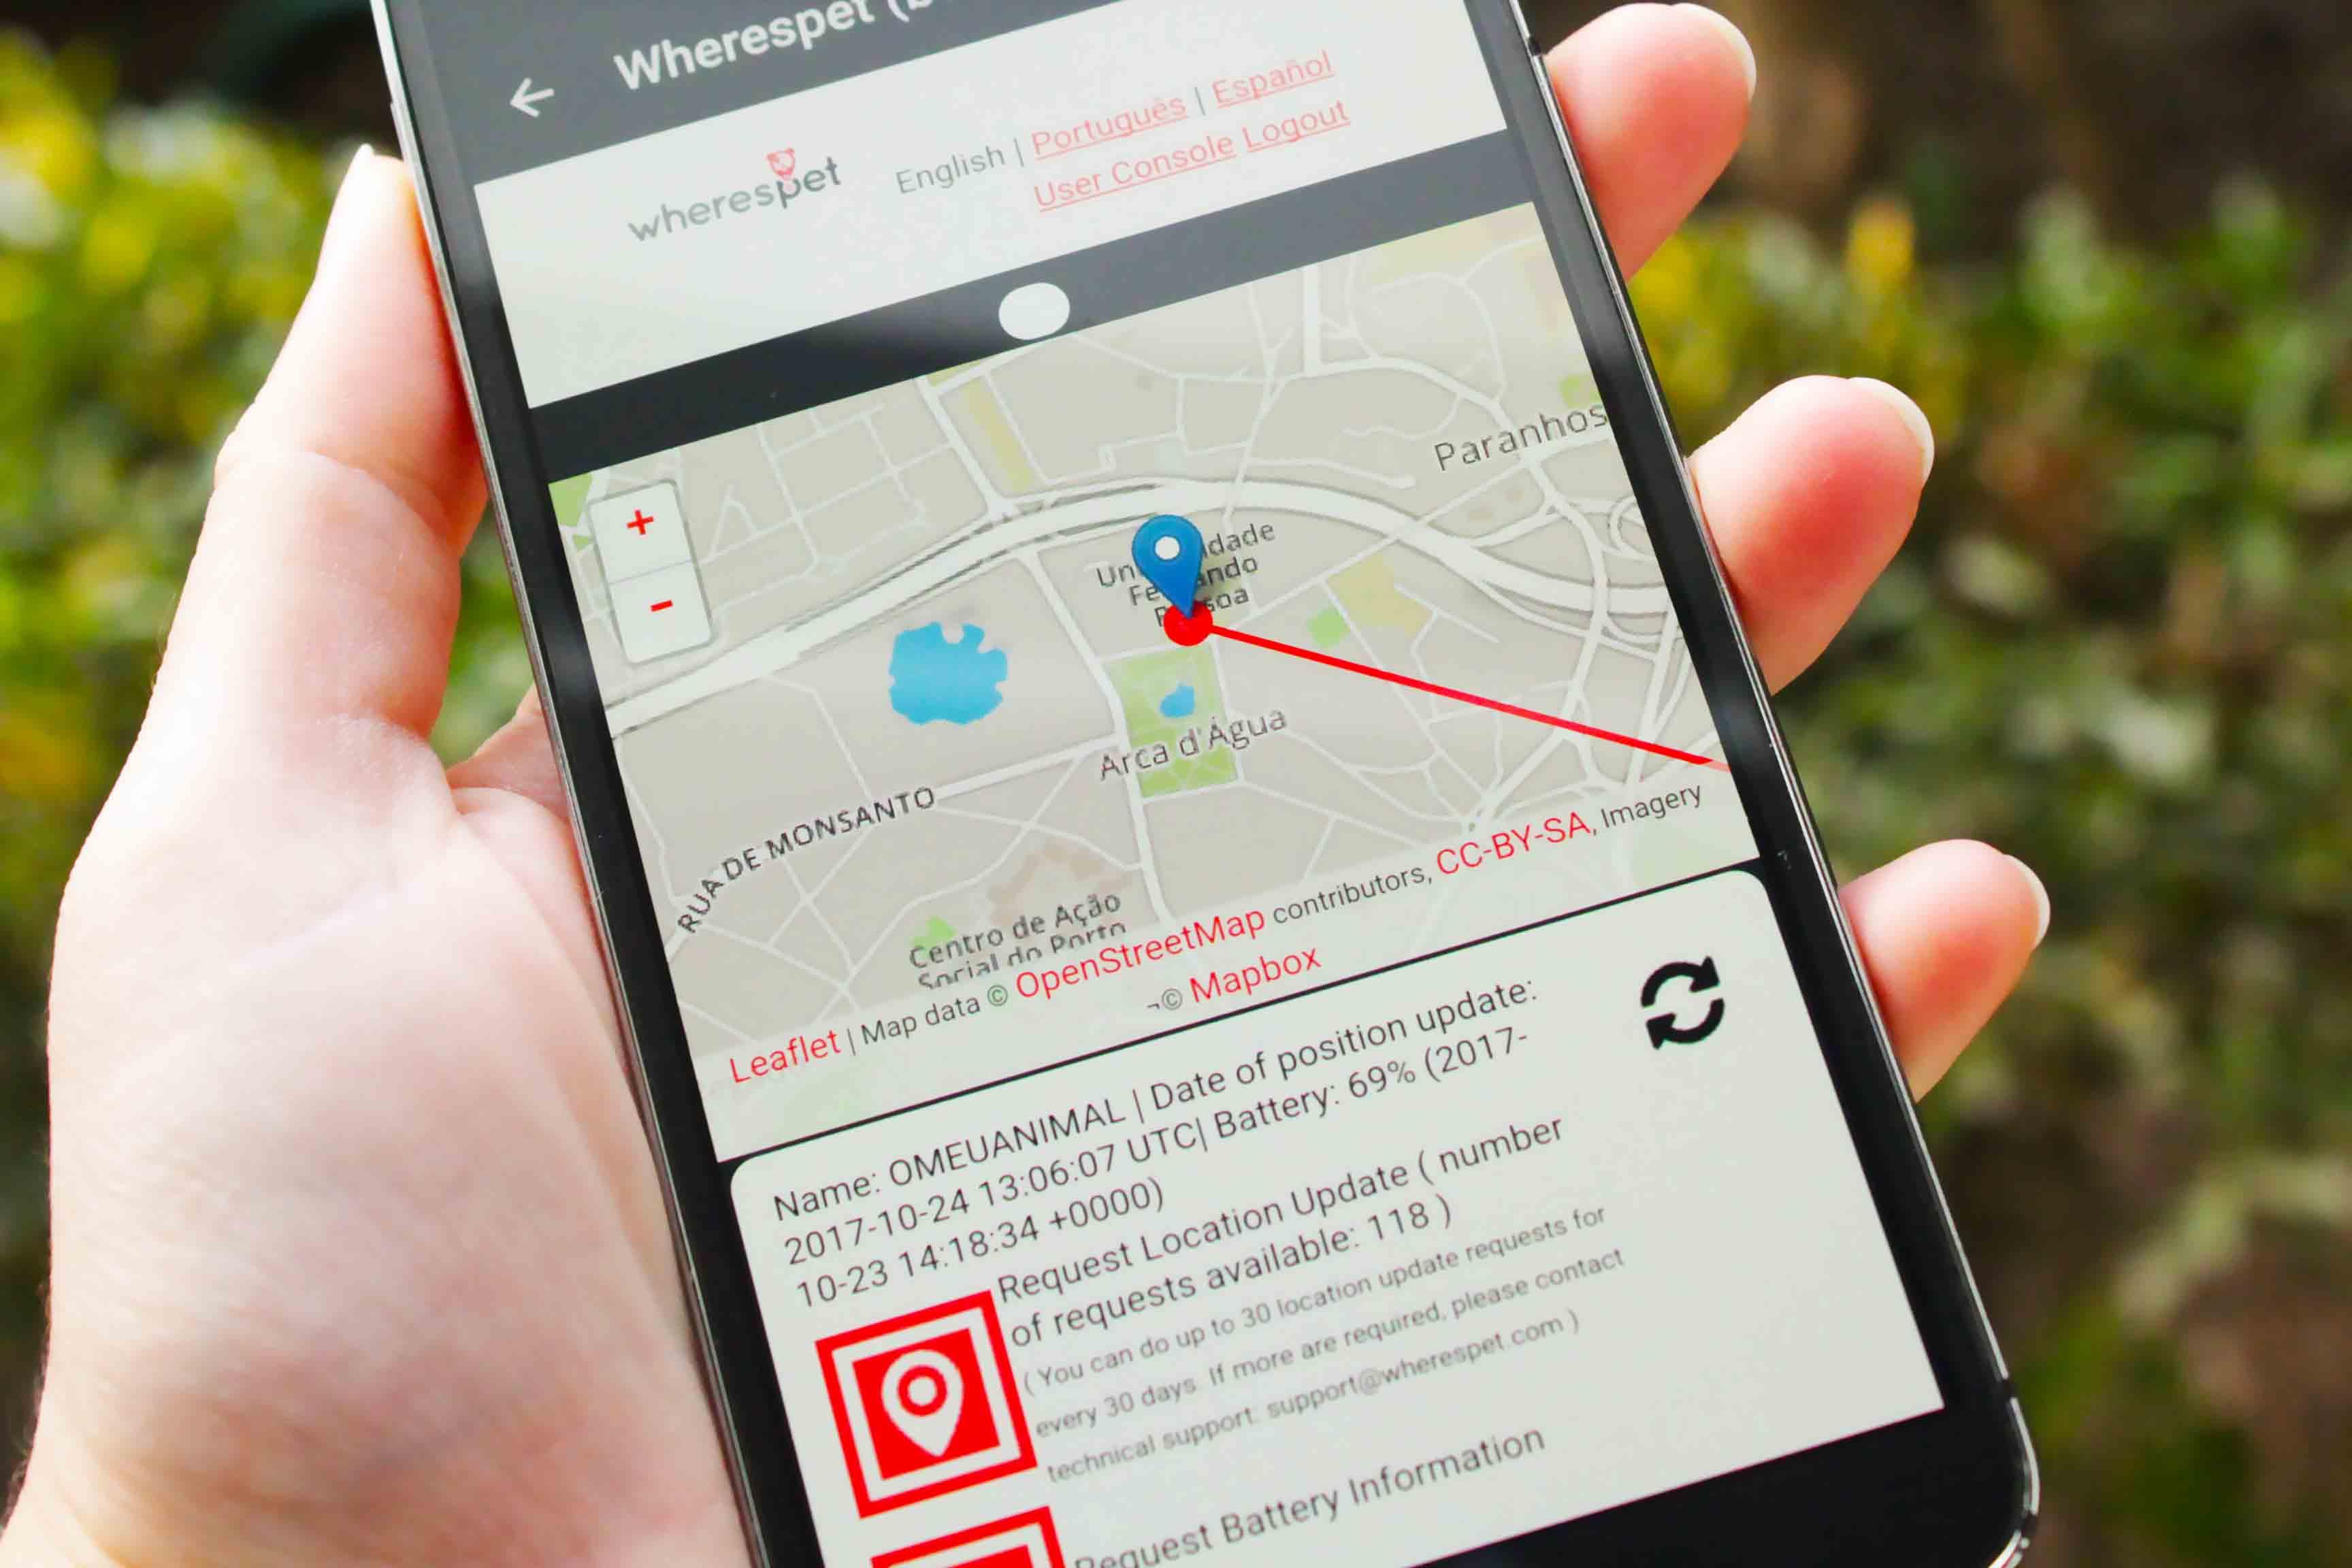 Wherespet - GPS Locator for Pets